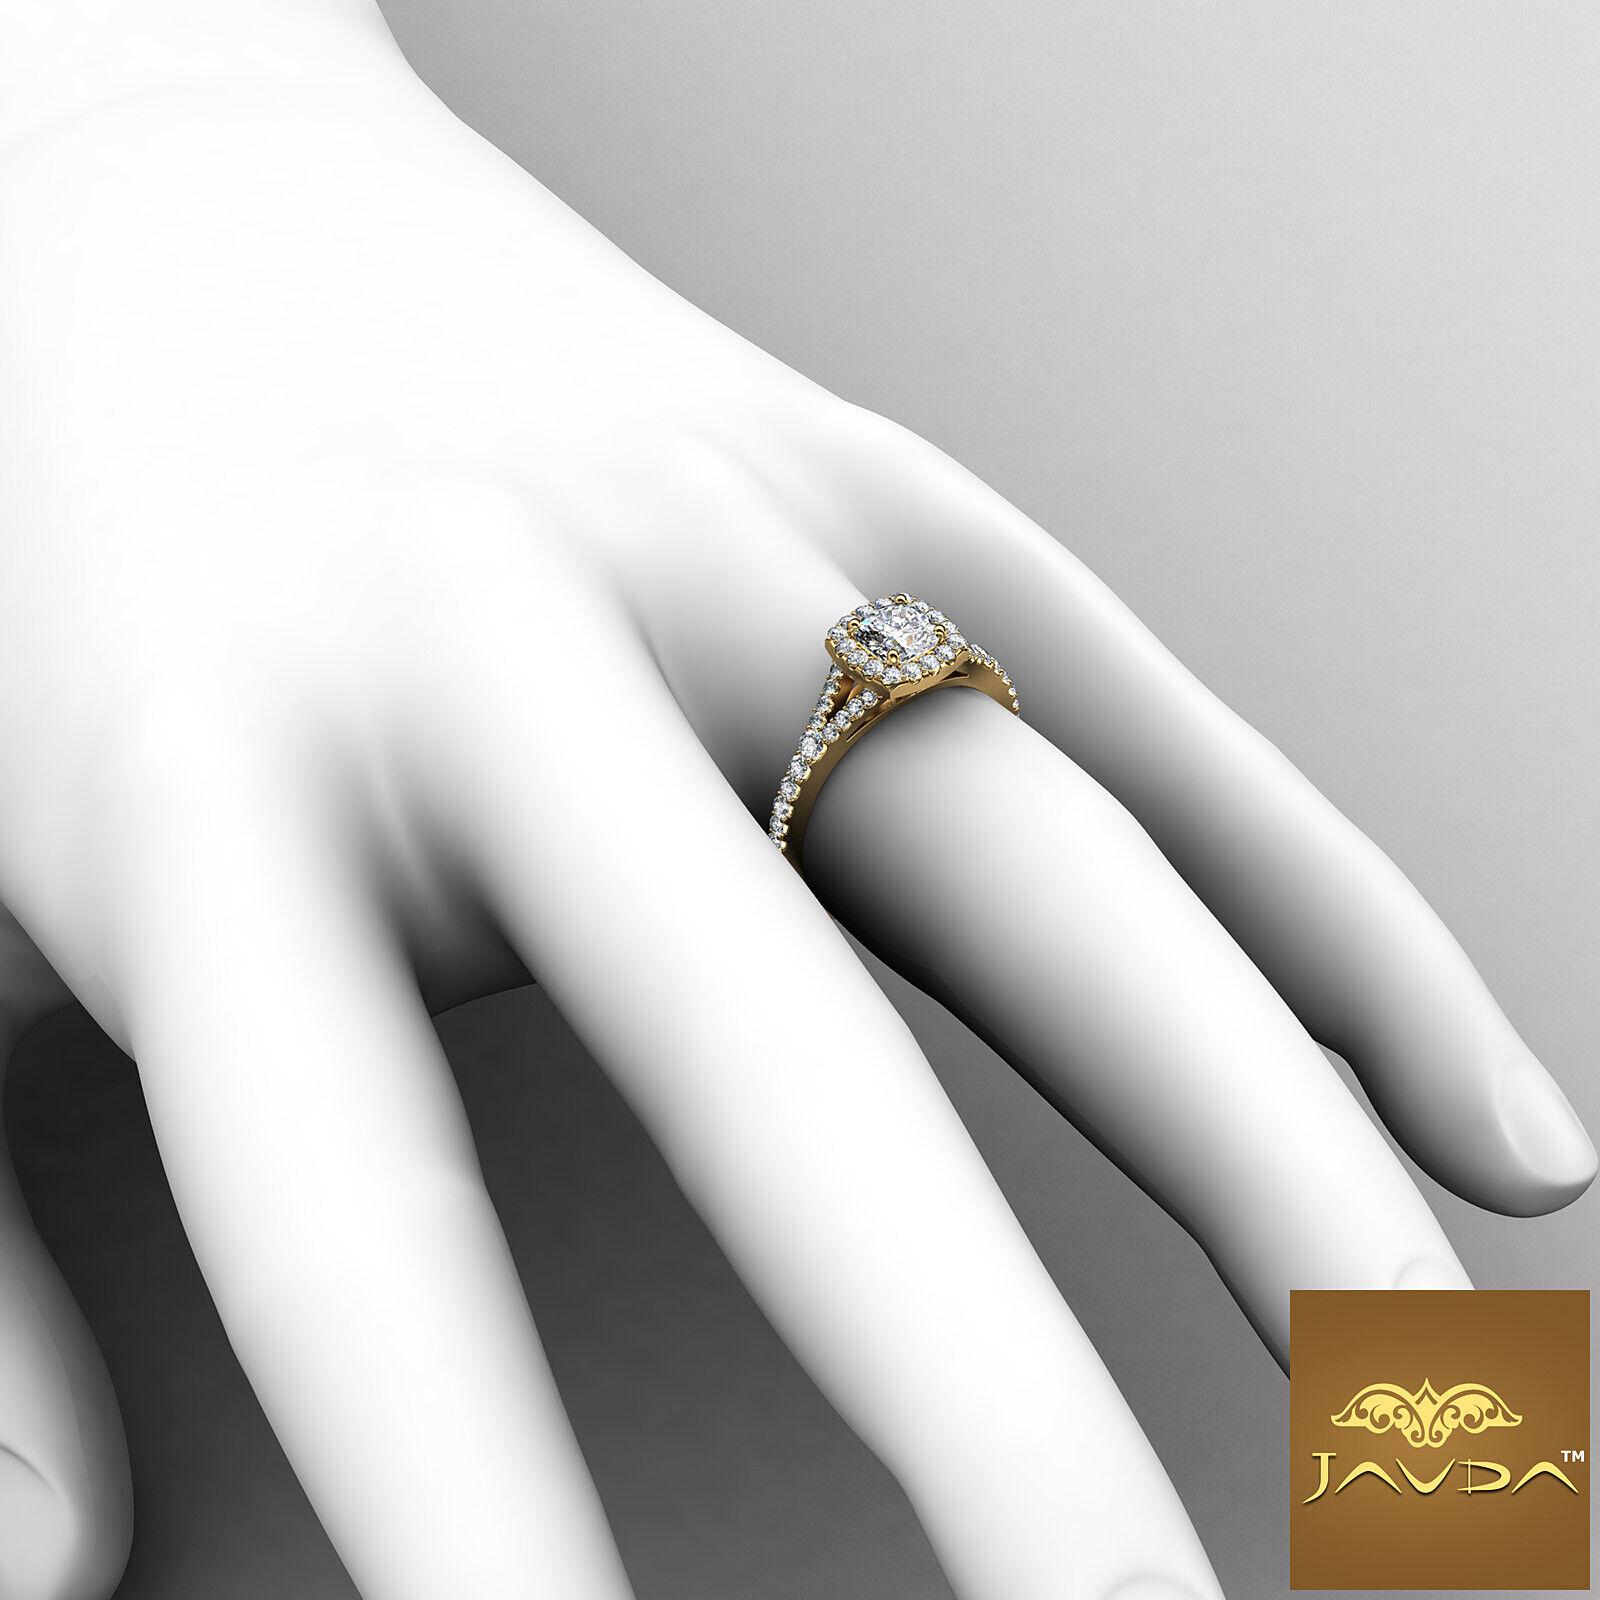 Split Shank Cushion Diamond Engagement Yellow Gold U Pave Ring GIA H VVS2 1 Ct 4